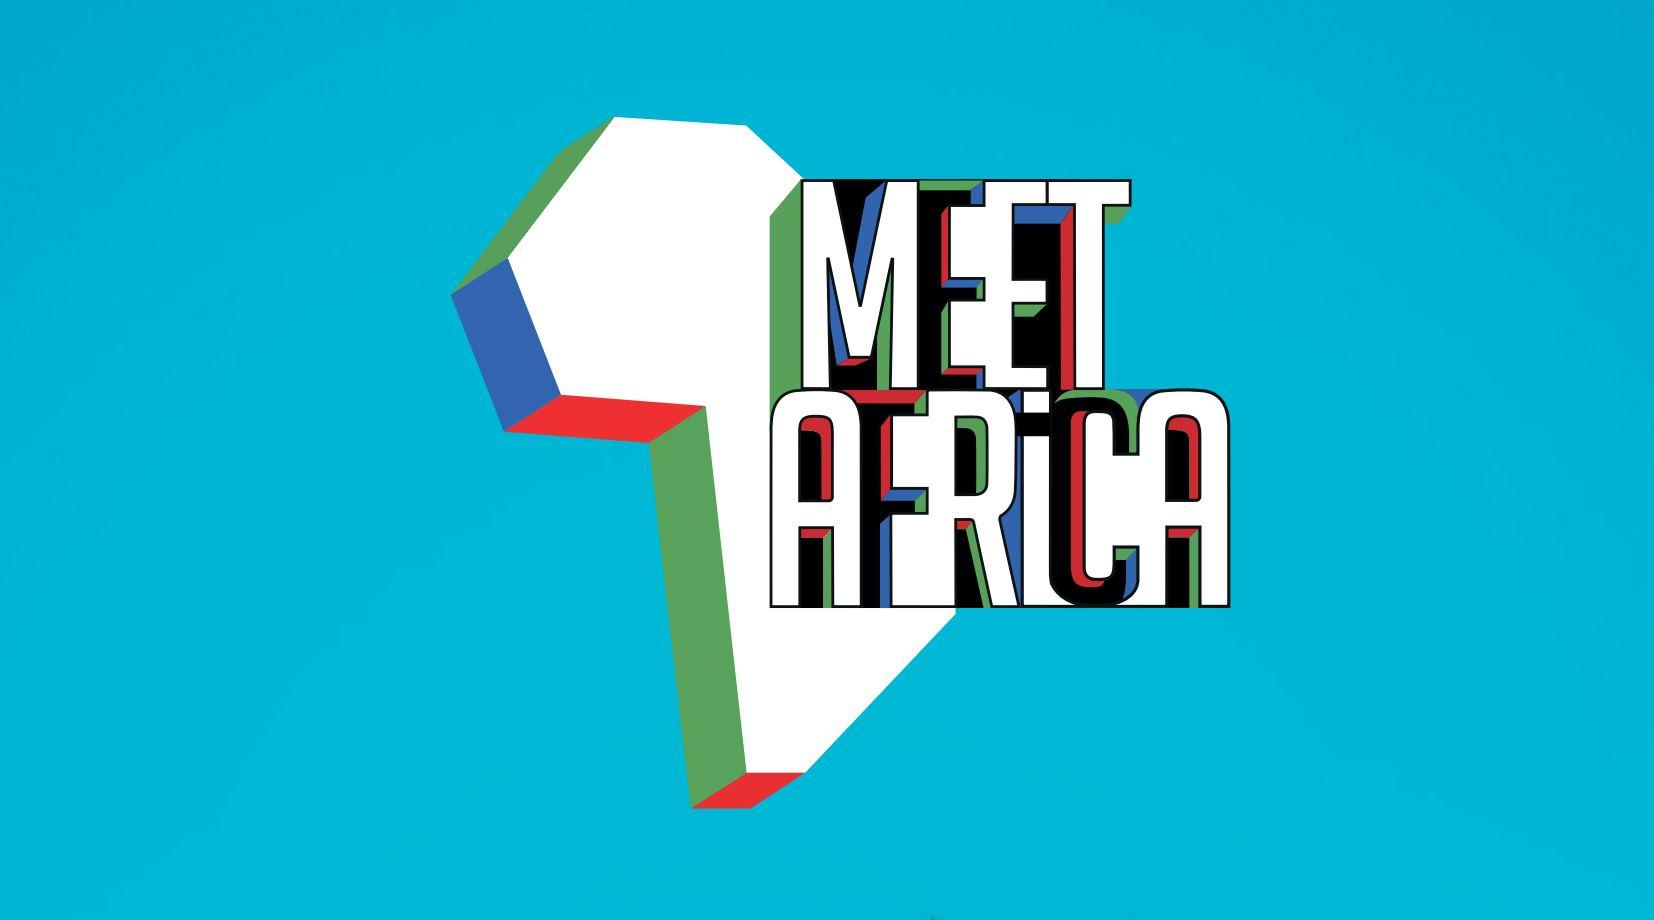 L'Association Maroc Entrepreneurs lance le Programme Meet Africa 2 Maroc